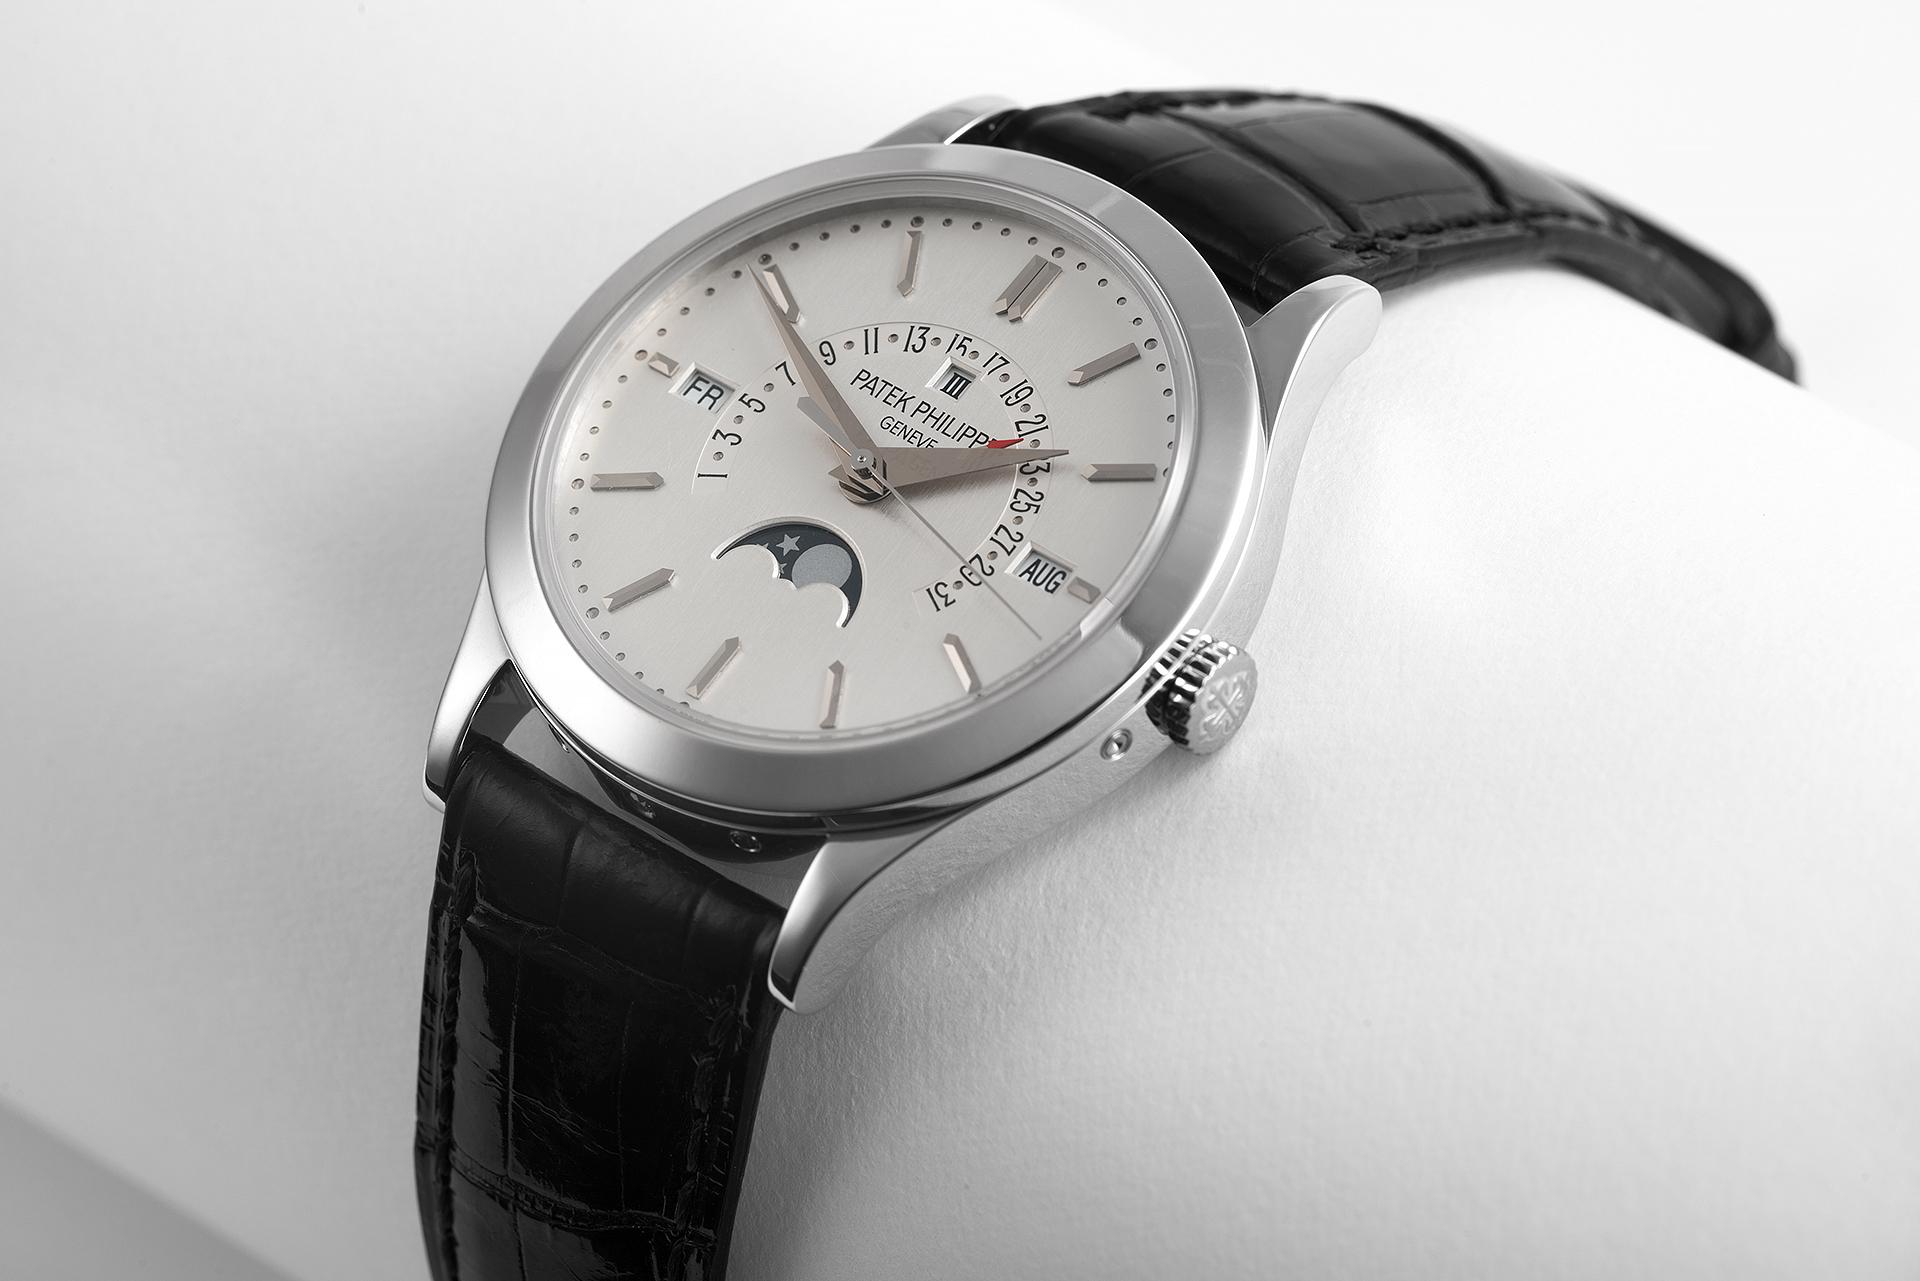 Patek Philippe Perpetual Calendar Watches   ref 5496P-001 ...